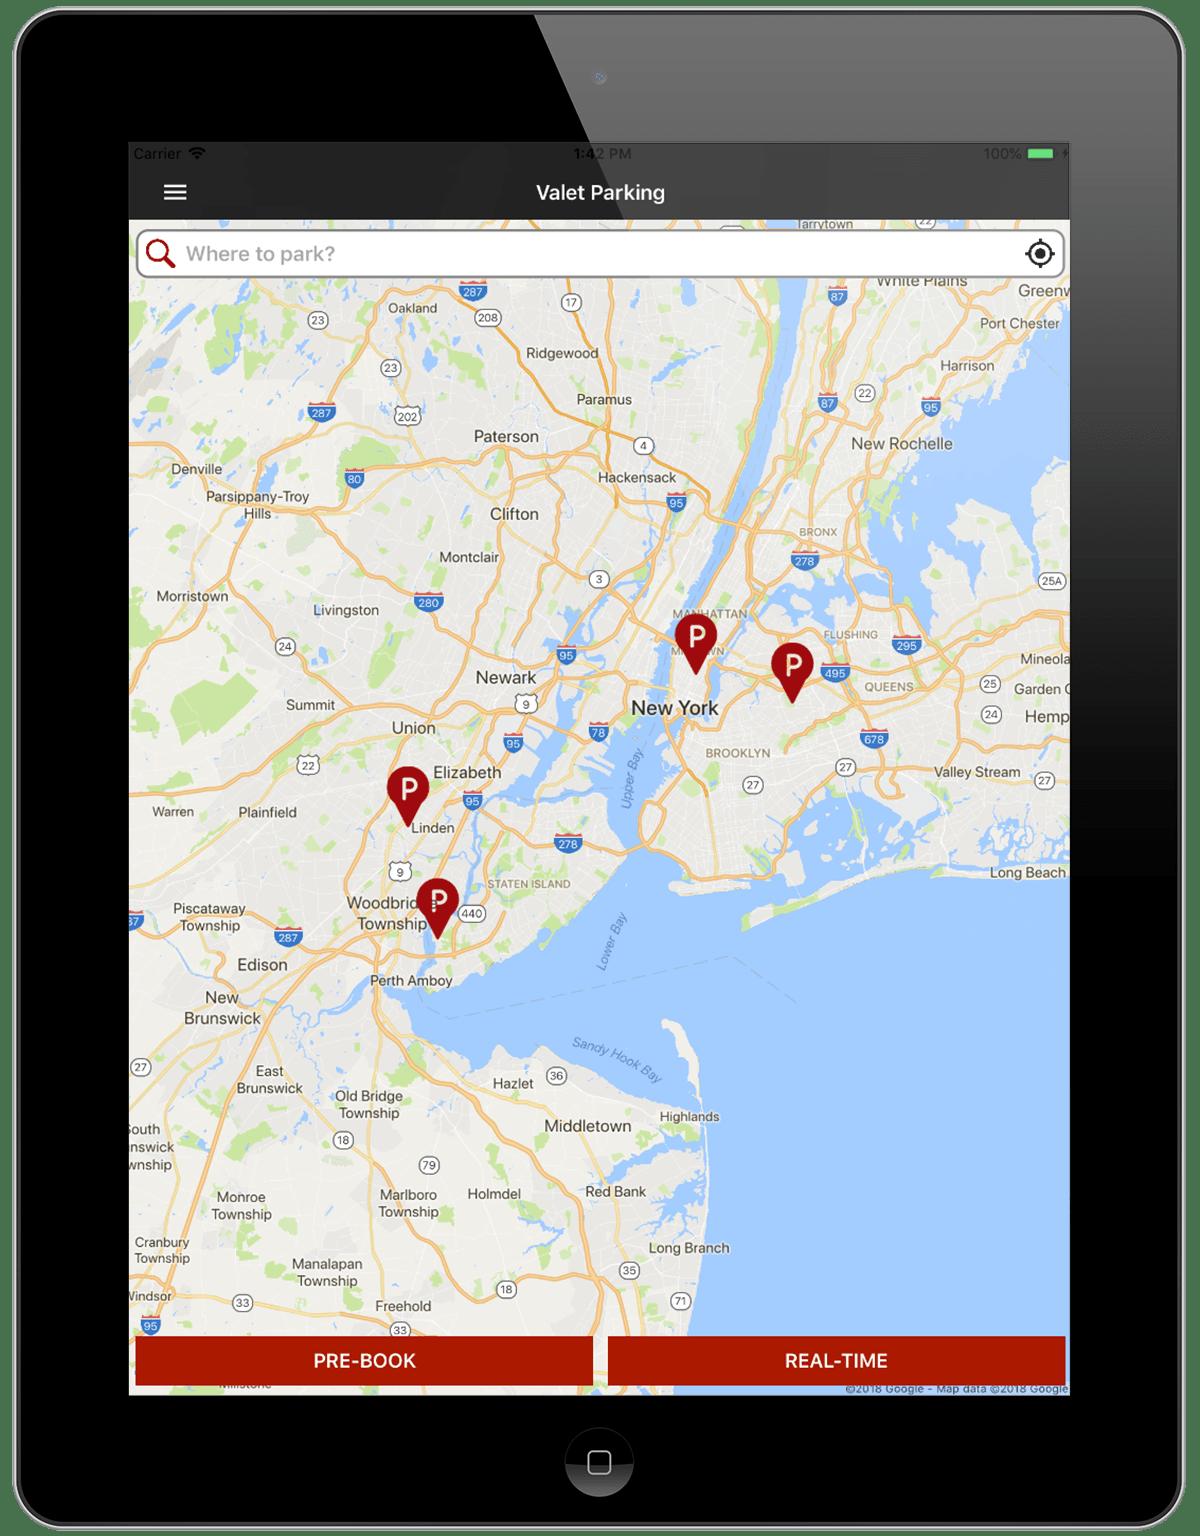 Valet Car Parking Finder Application-iPad-location